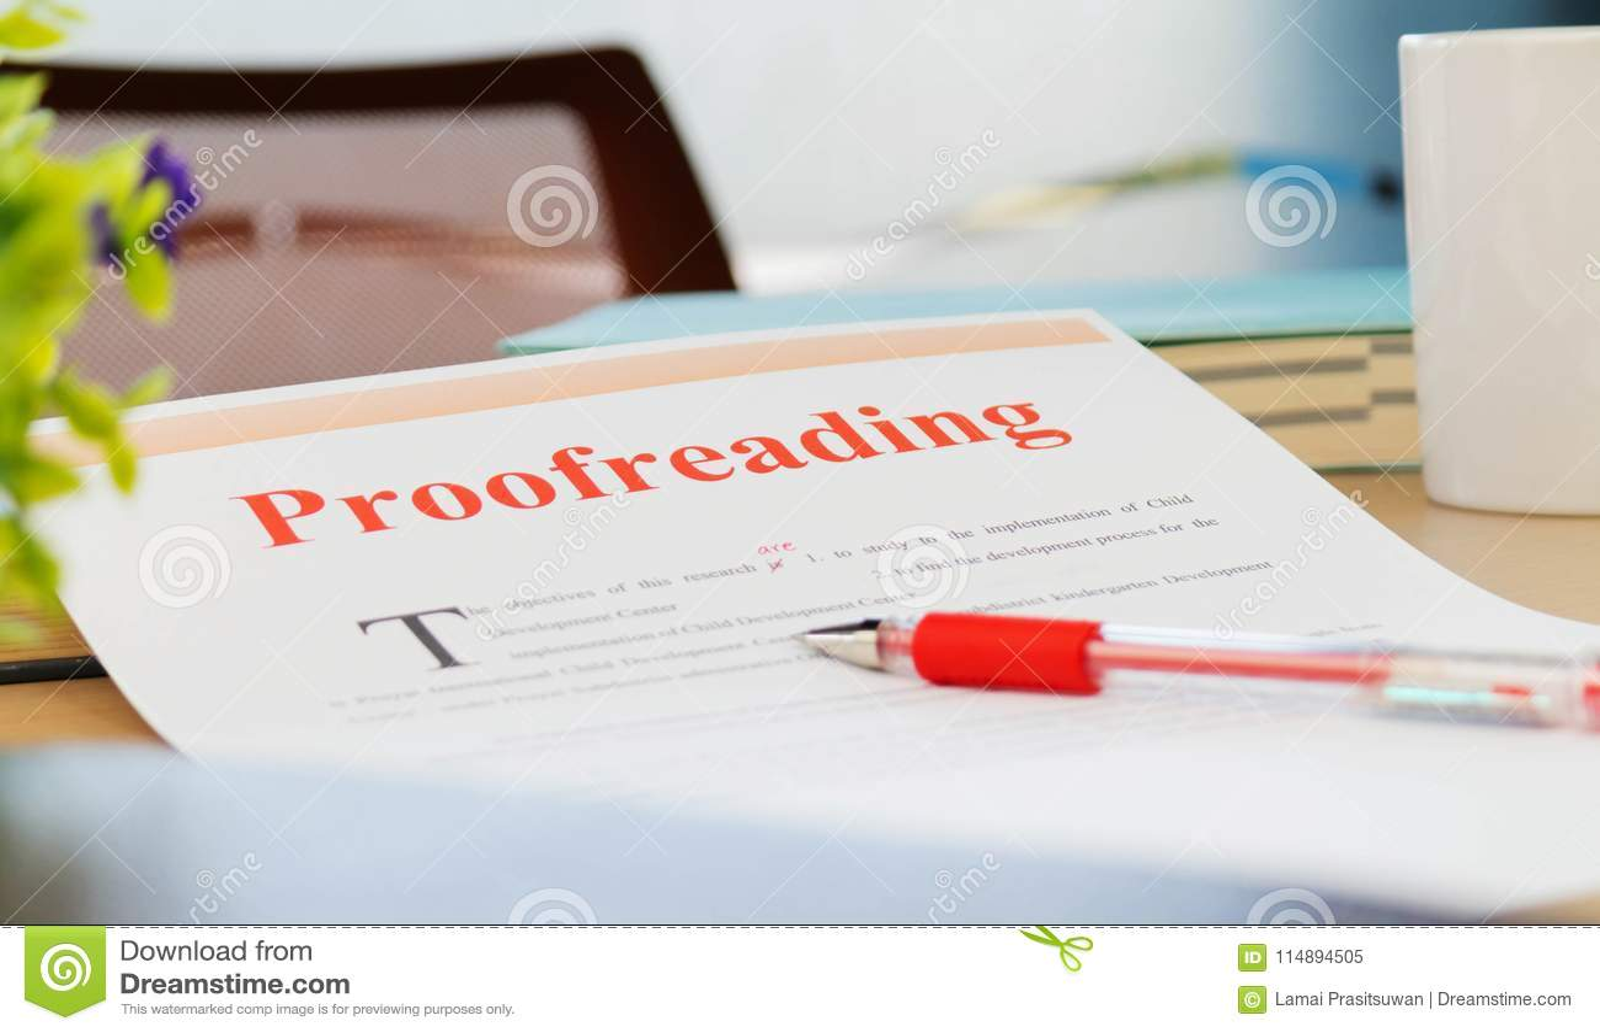 dissertation writing help uk